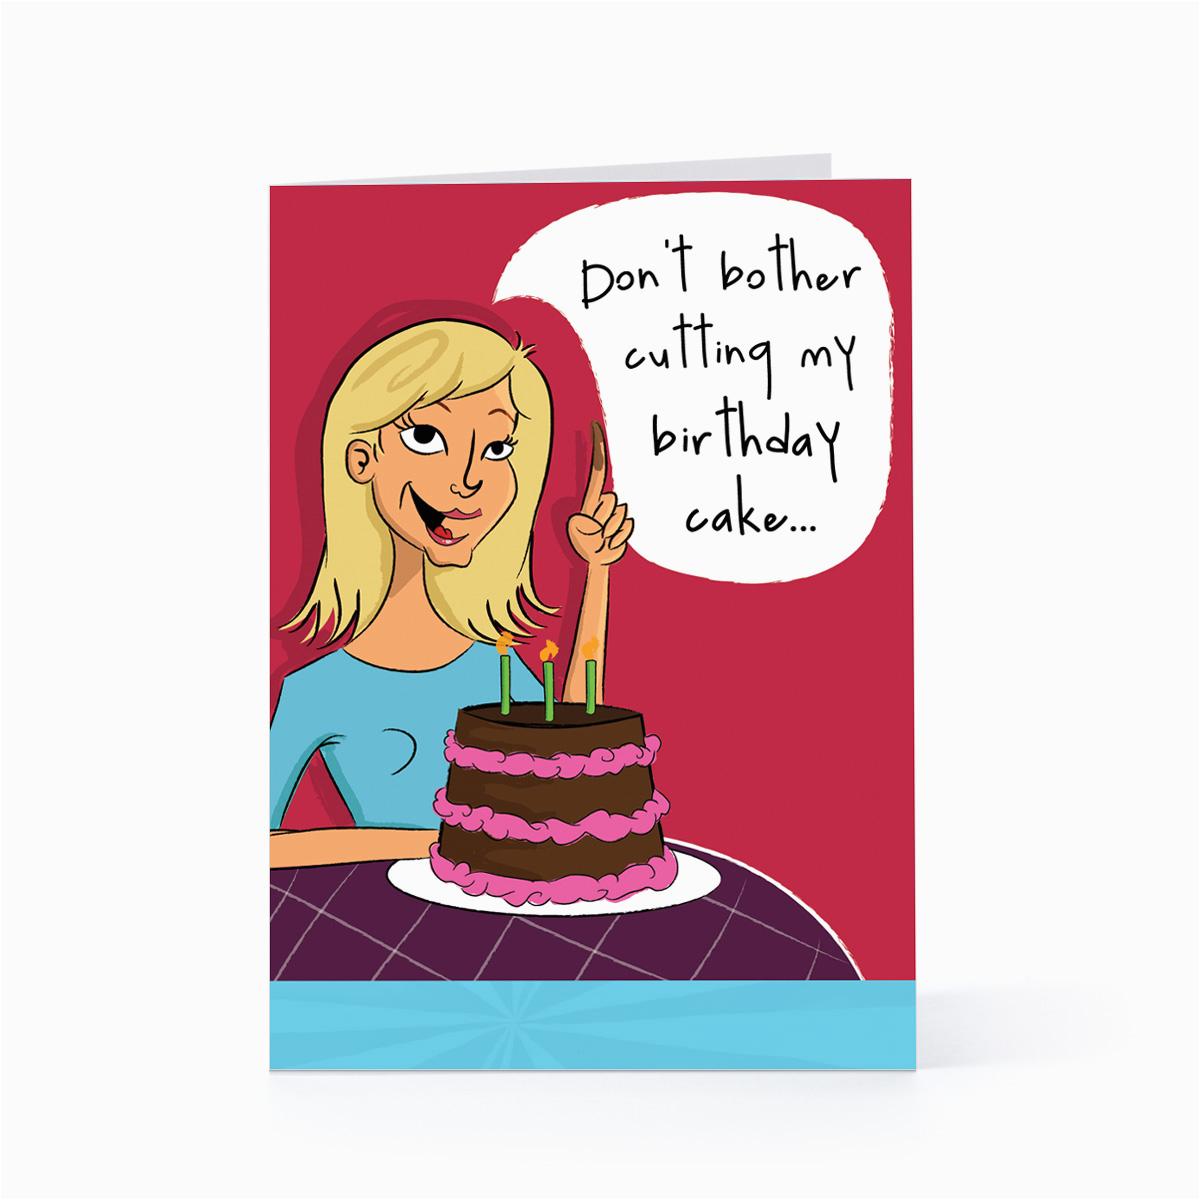 hallmark card quotes for birthdays